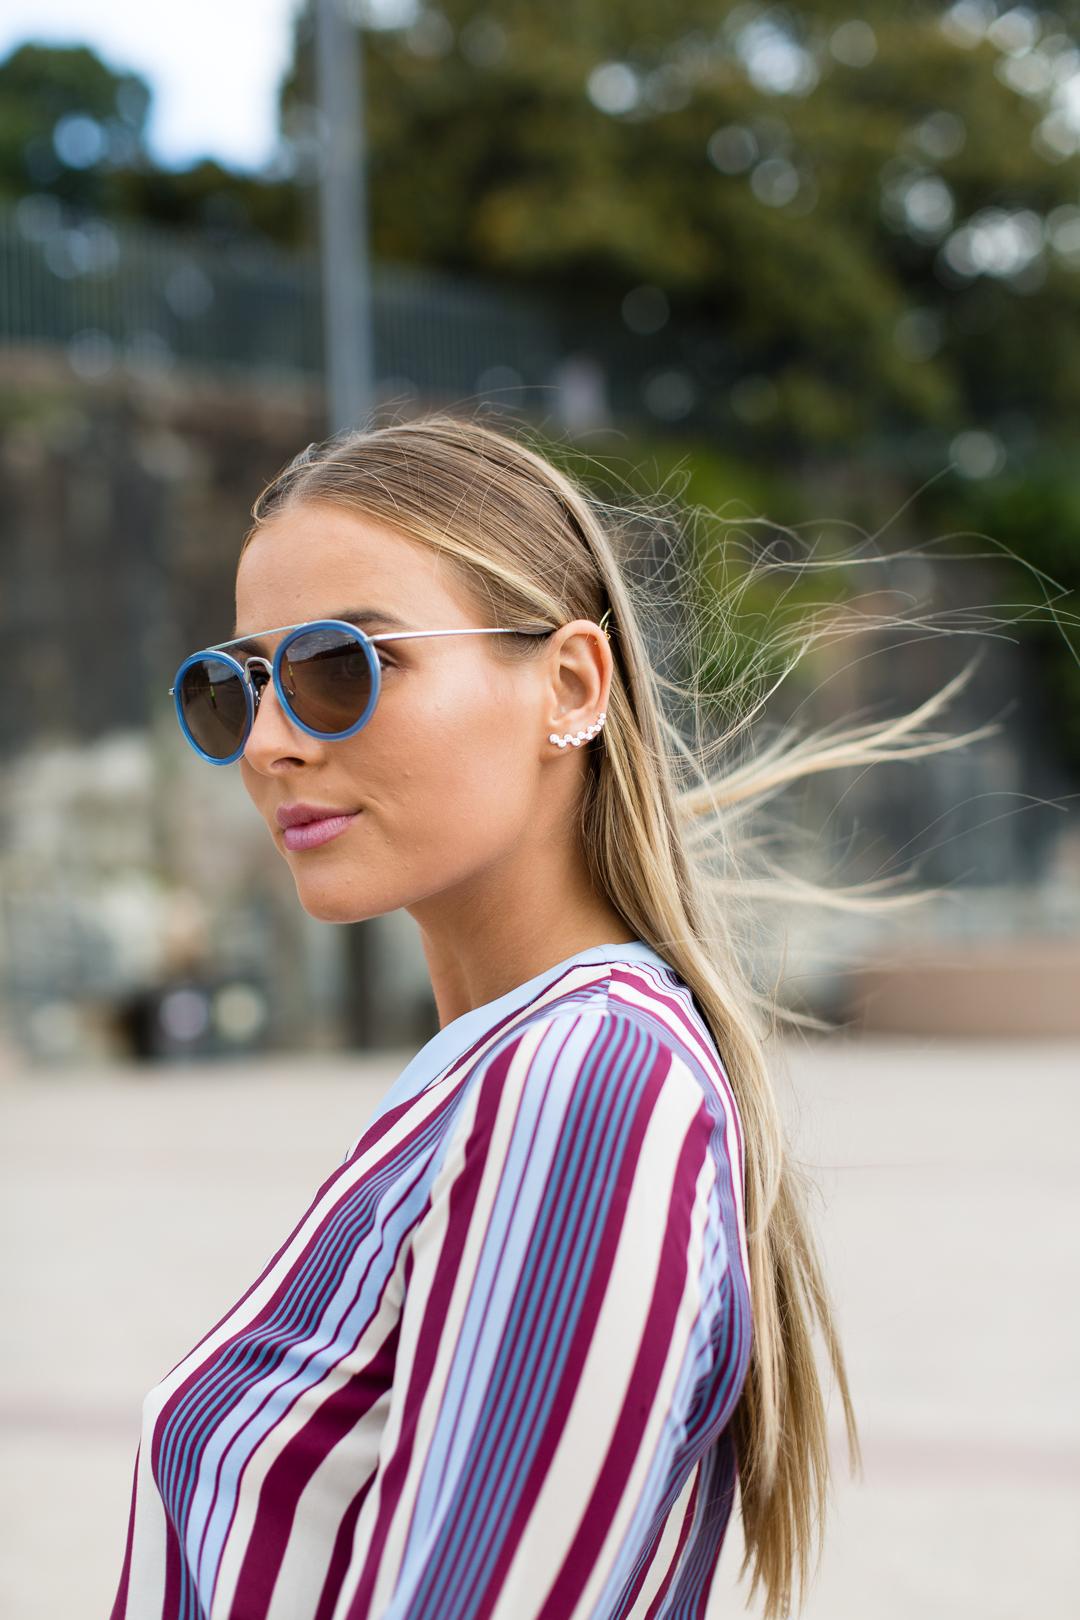 Paige-Newton-Sydney-Fashion-Week-Sydney-Chic-Blogger-Mananement0003.jpg